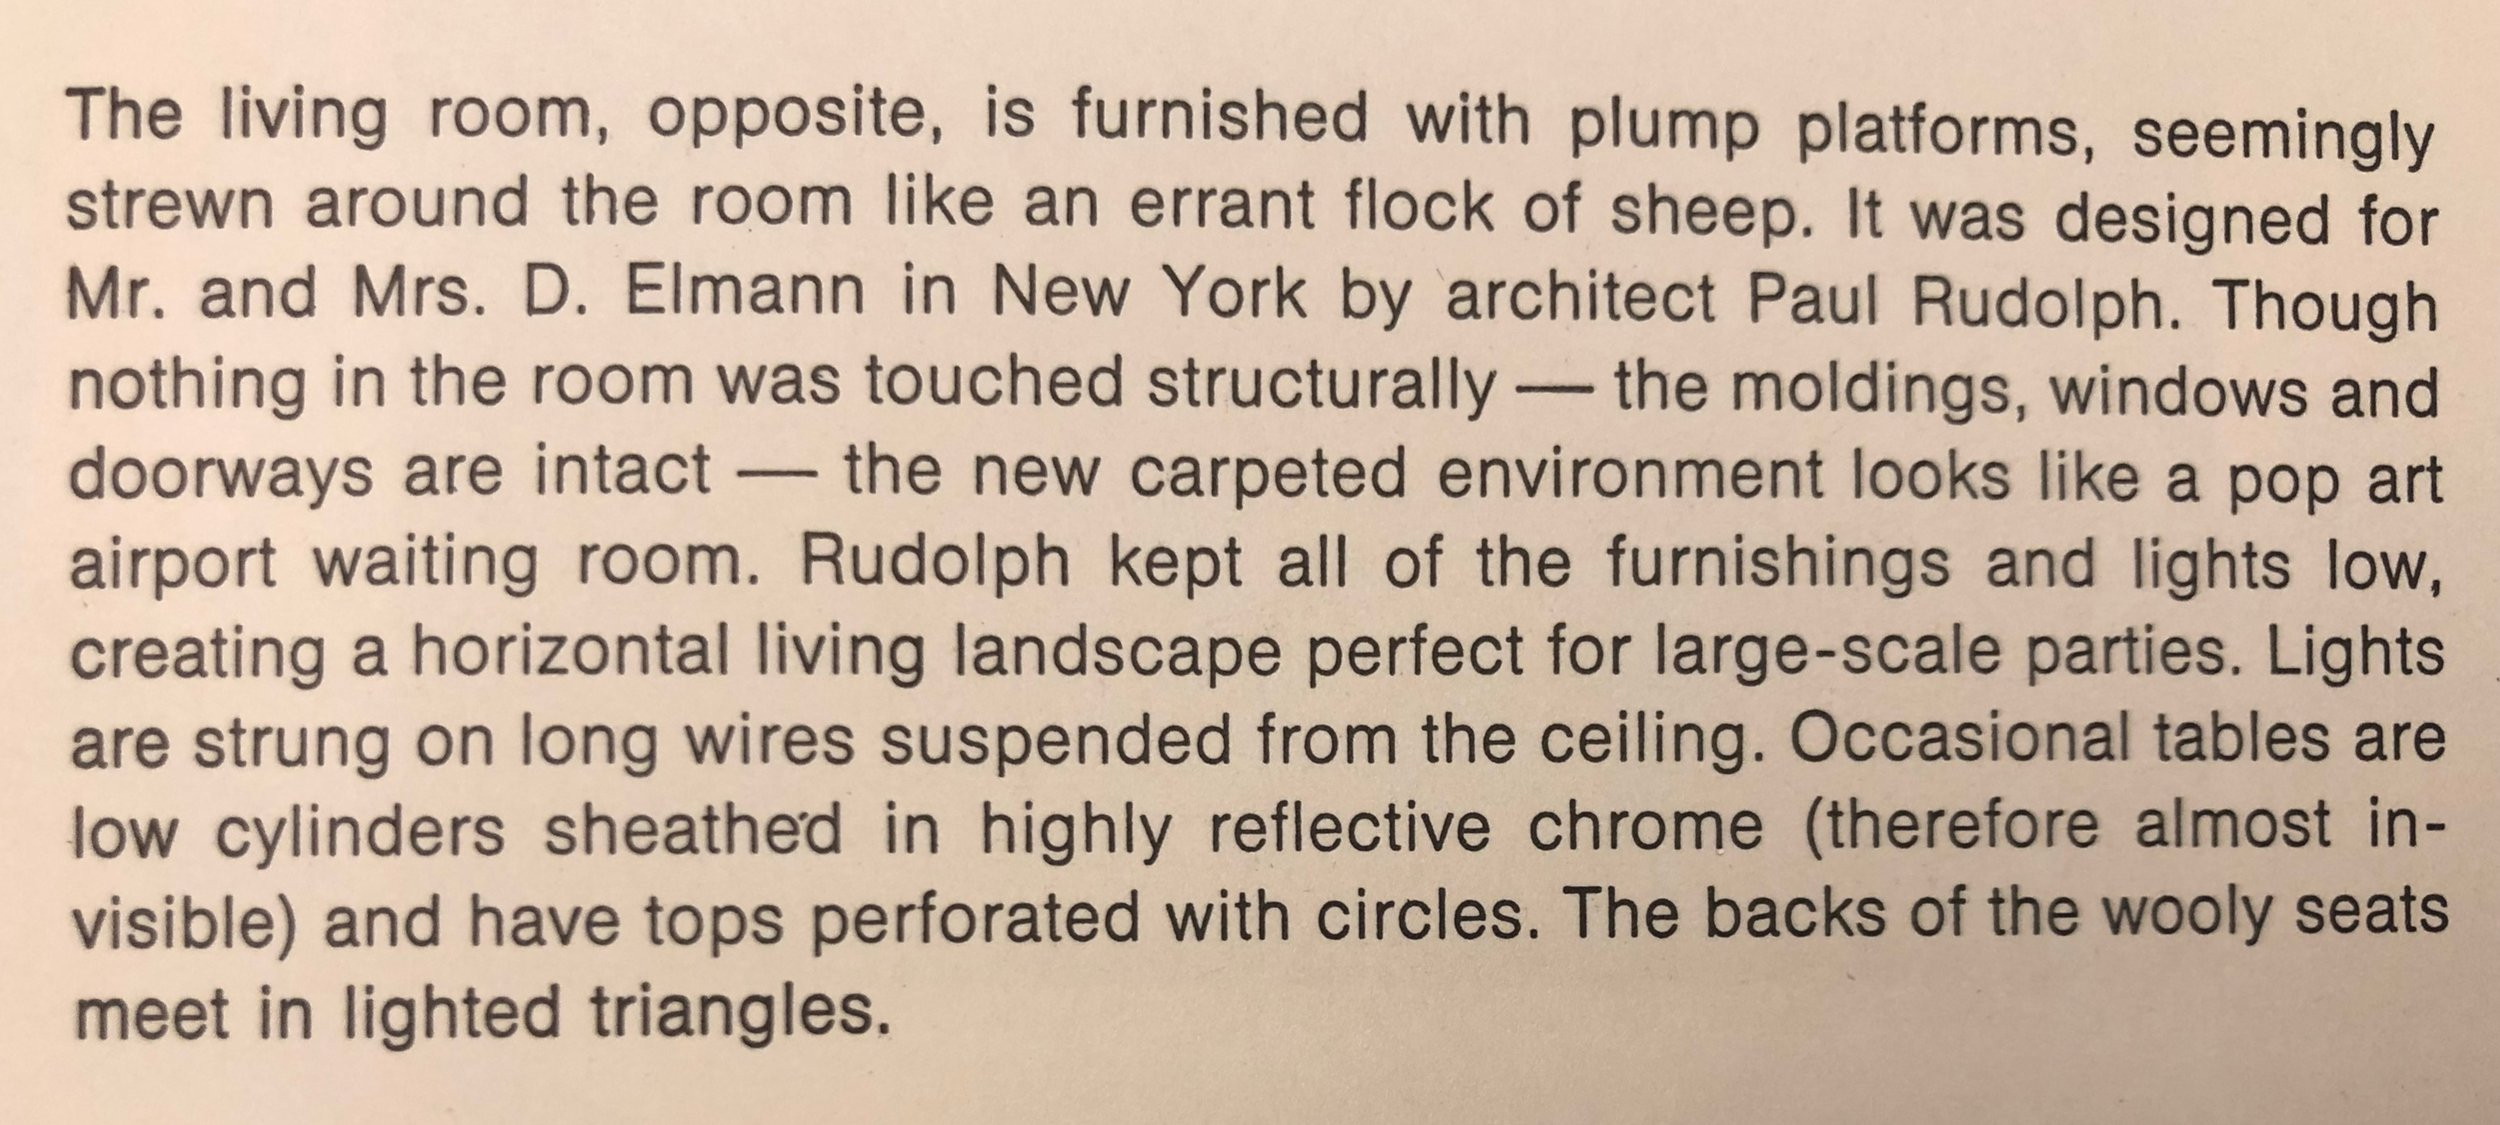 Rudolph capton.JPG